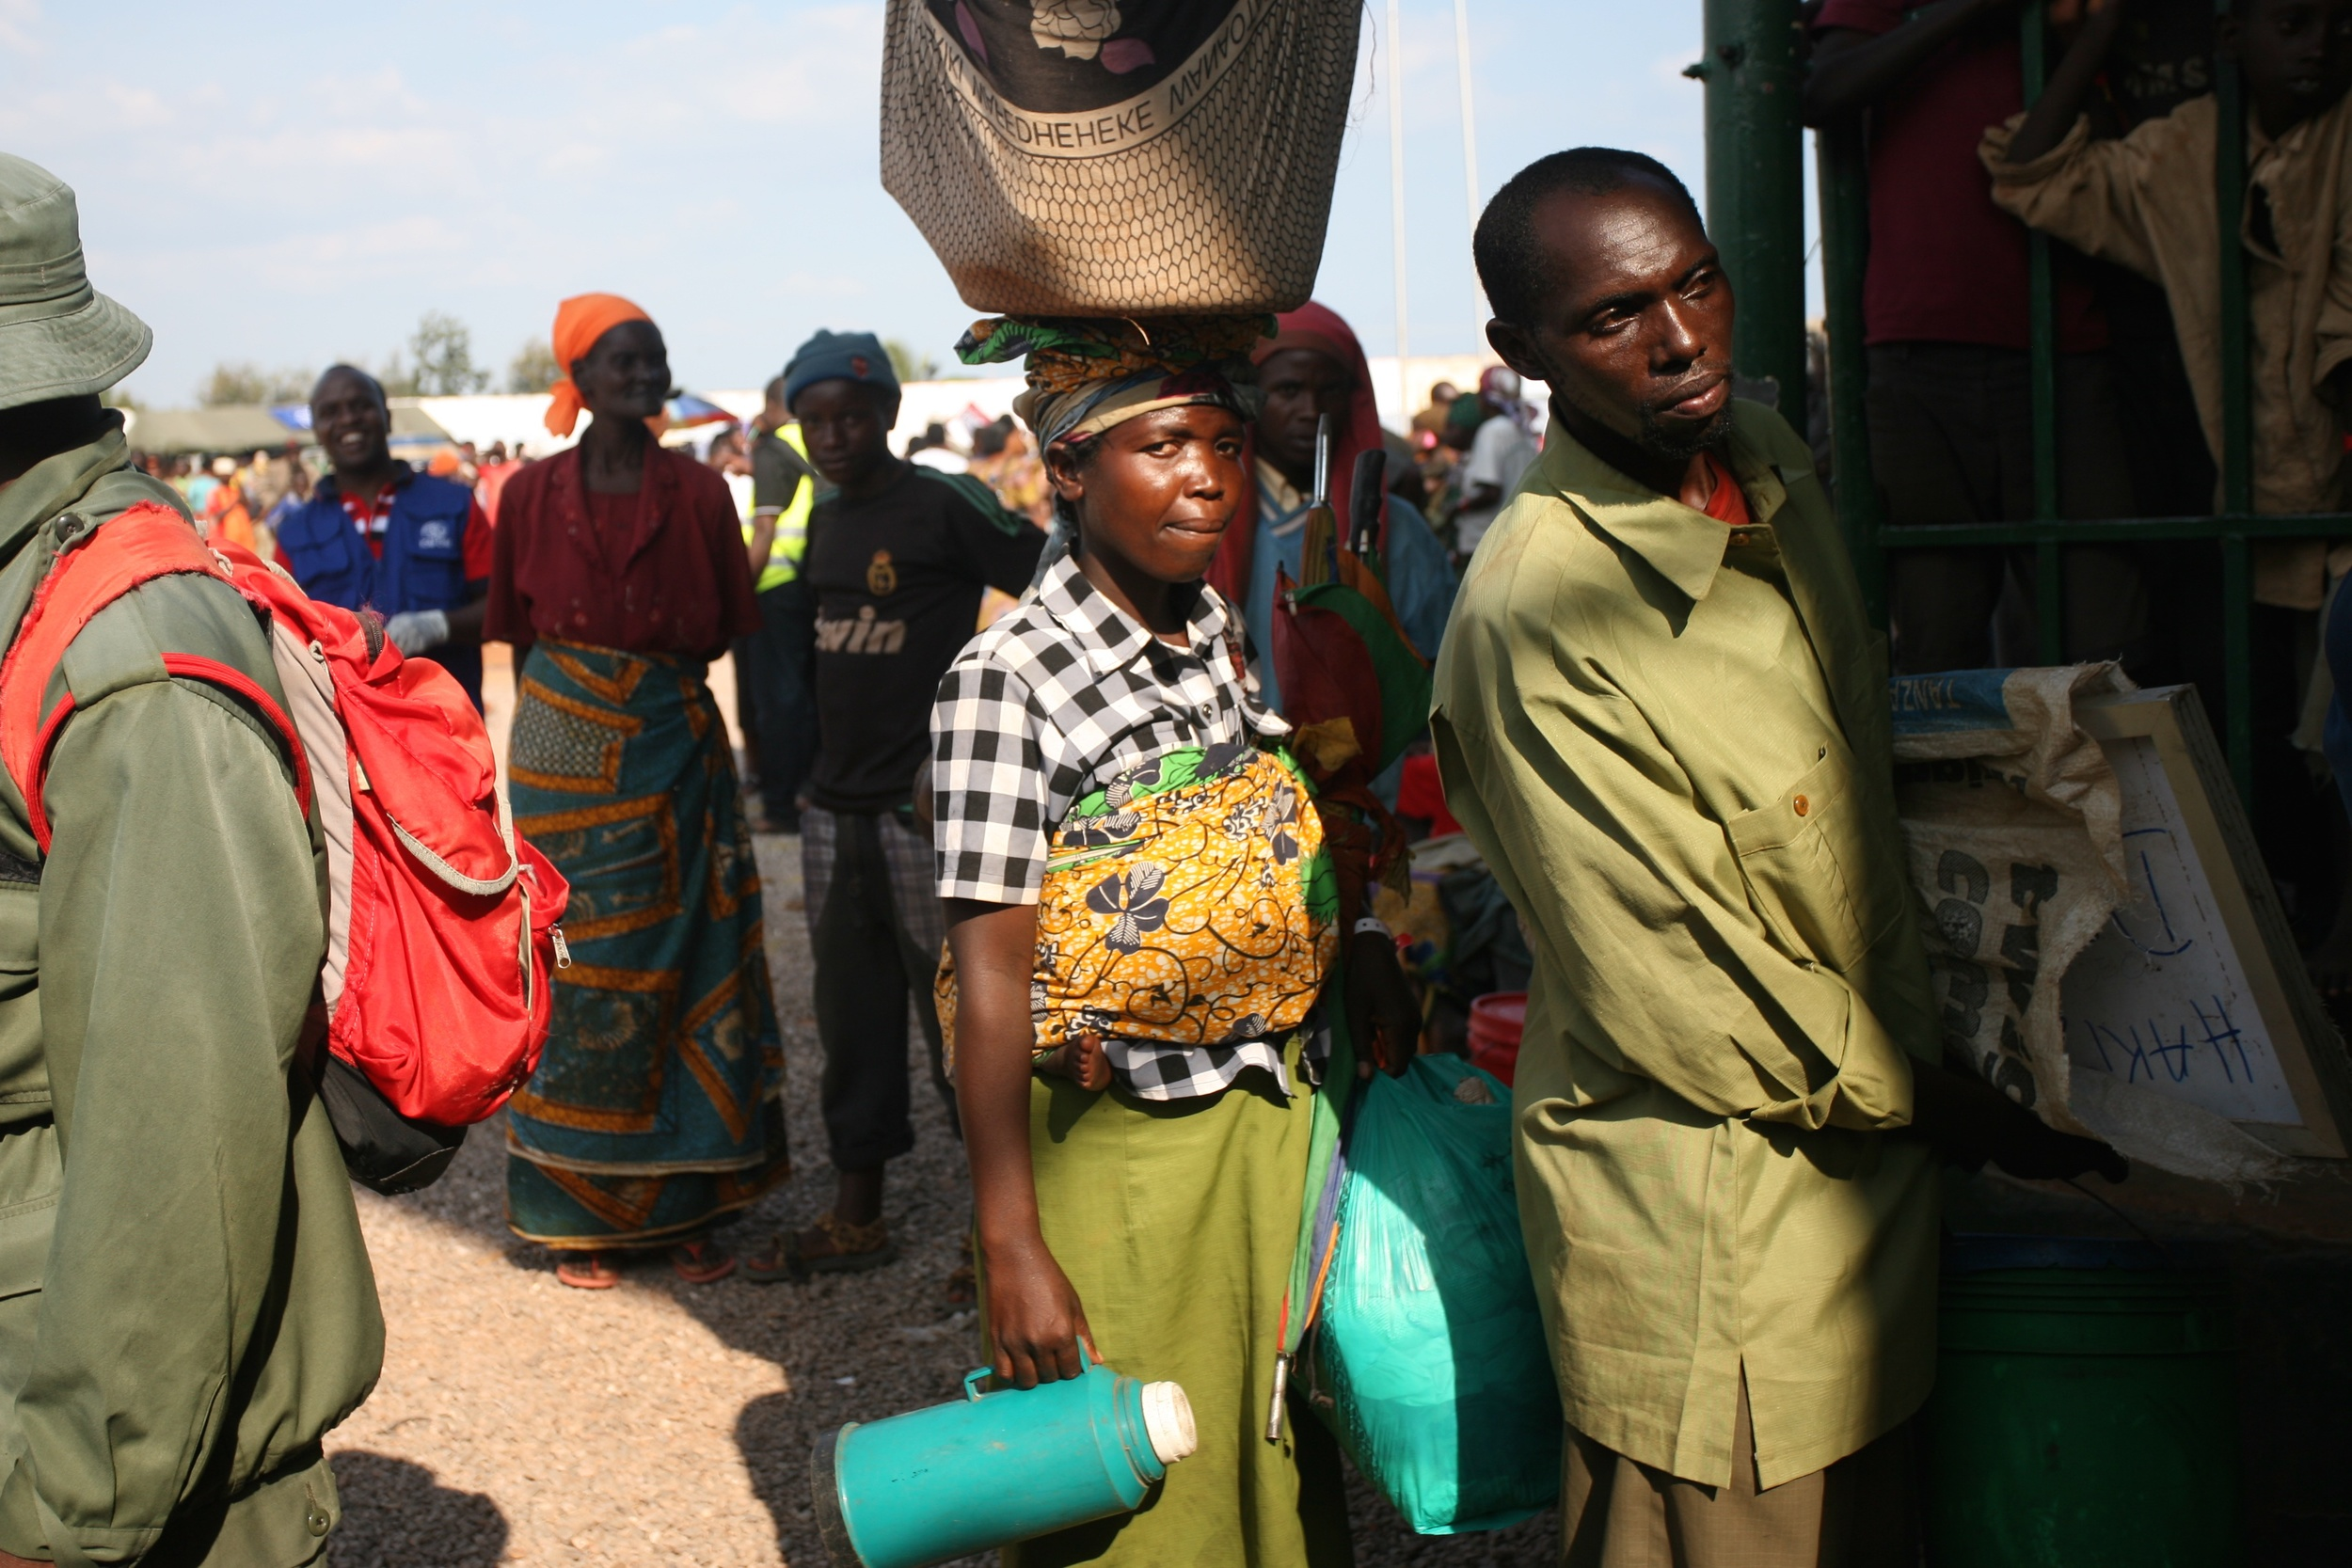 A Burundian refugee queues at Lake Tanganyika Stadium in Kigoma, Tanzania, for the bus taking refugees to a permanent refugee camp